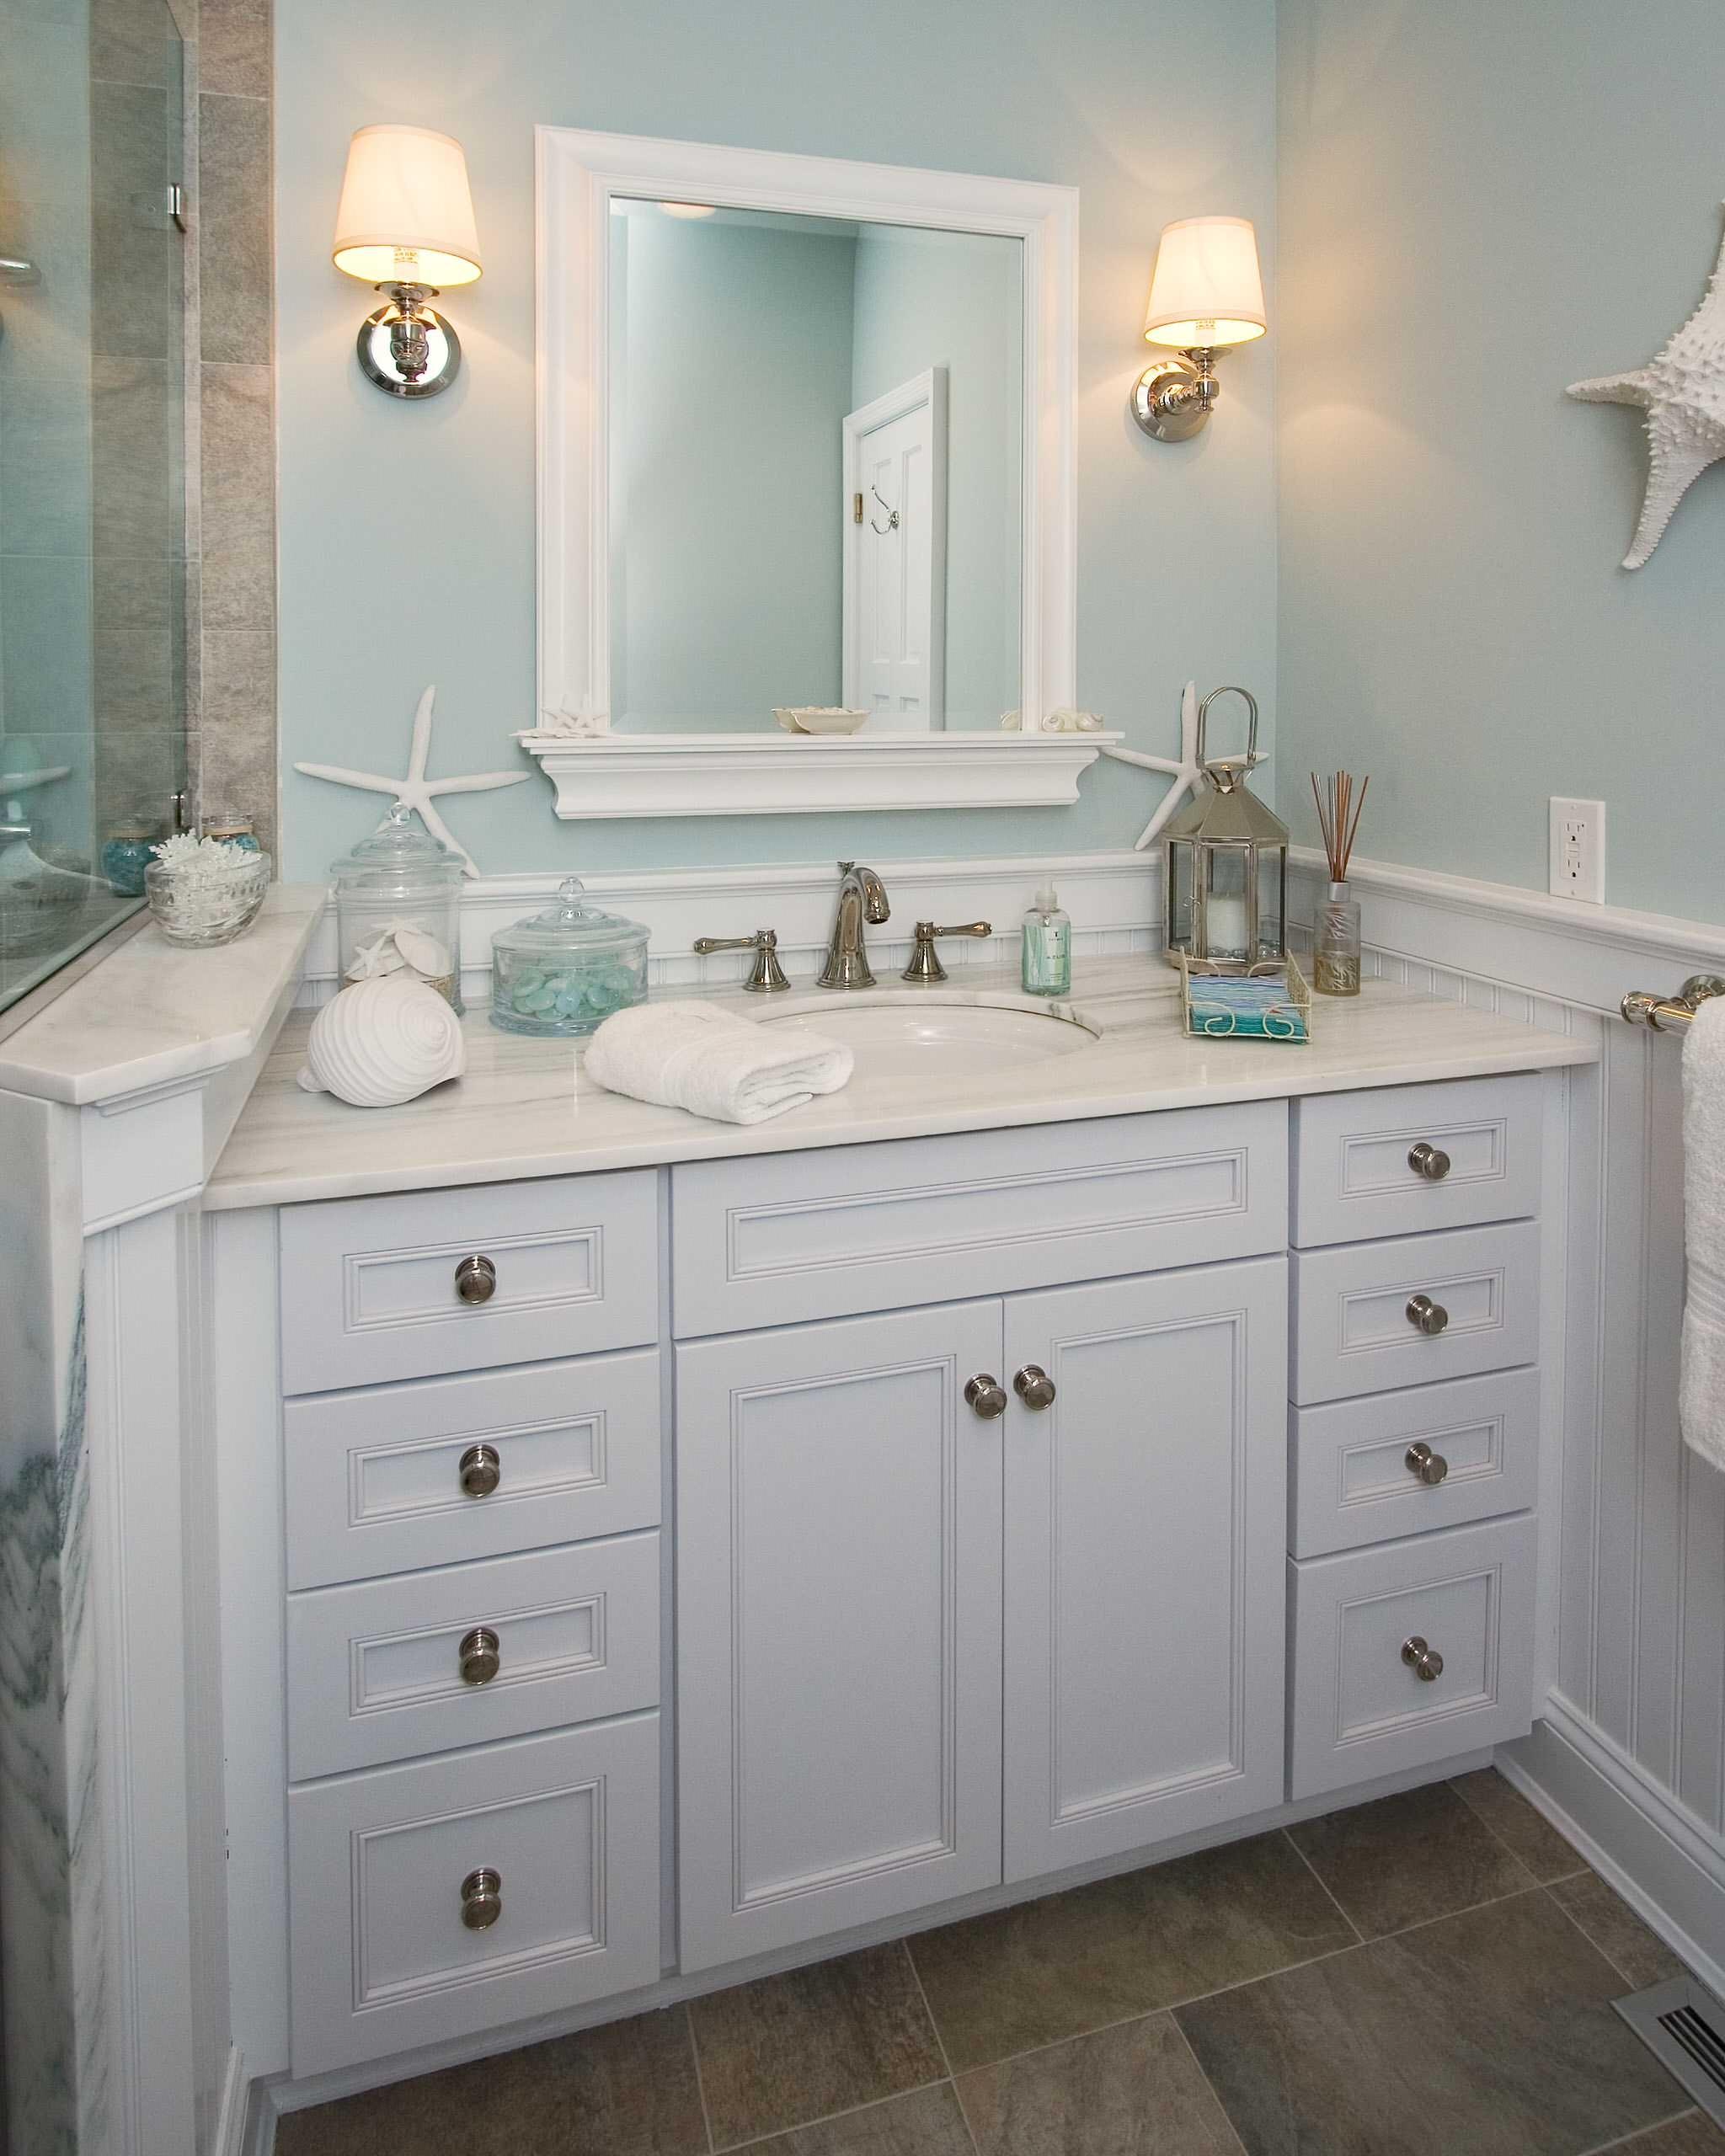 Turquoise Bathroom Vanity